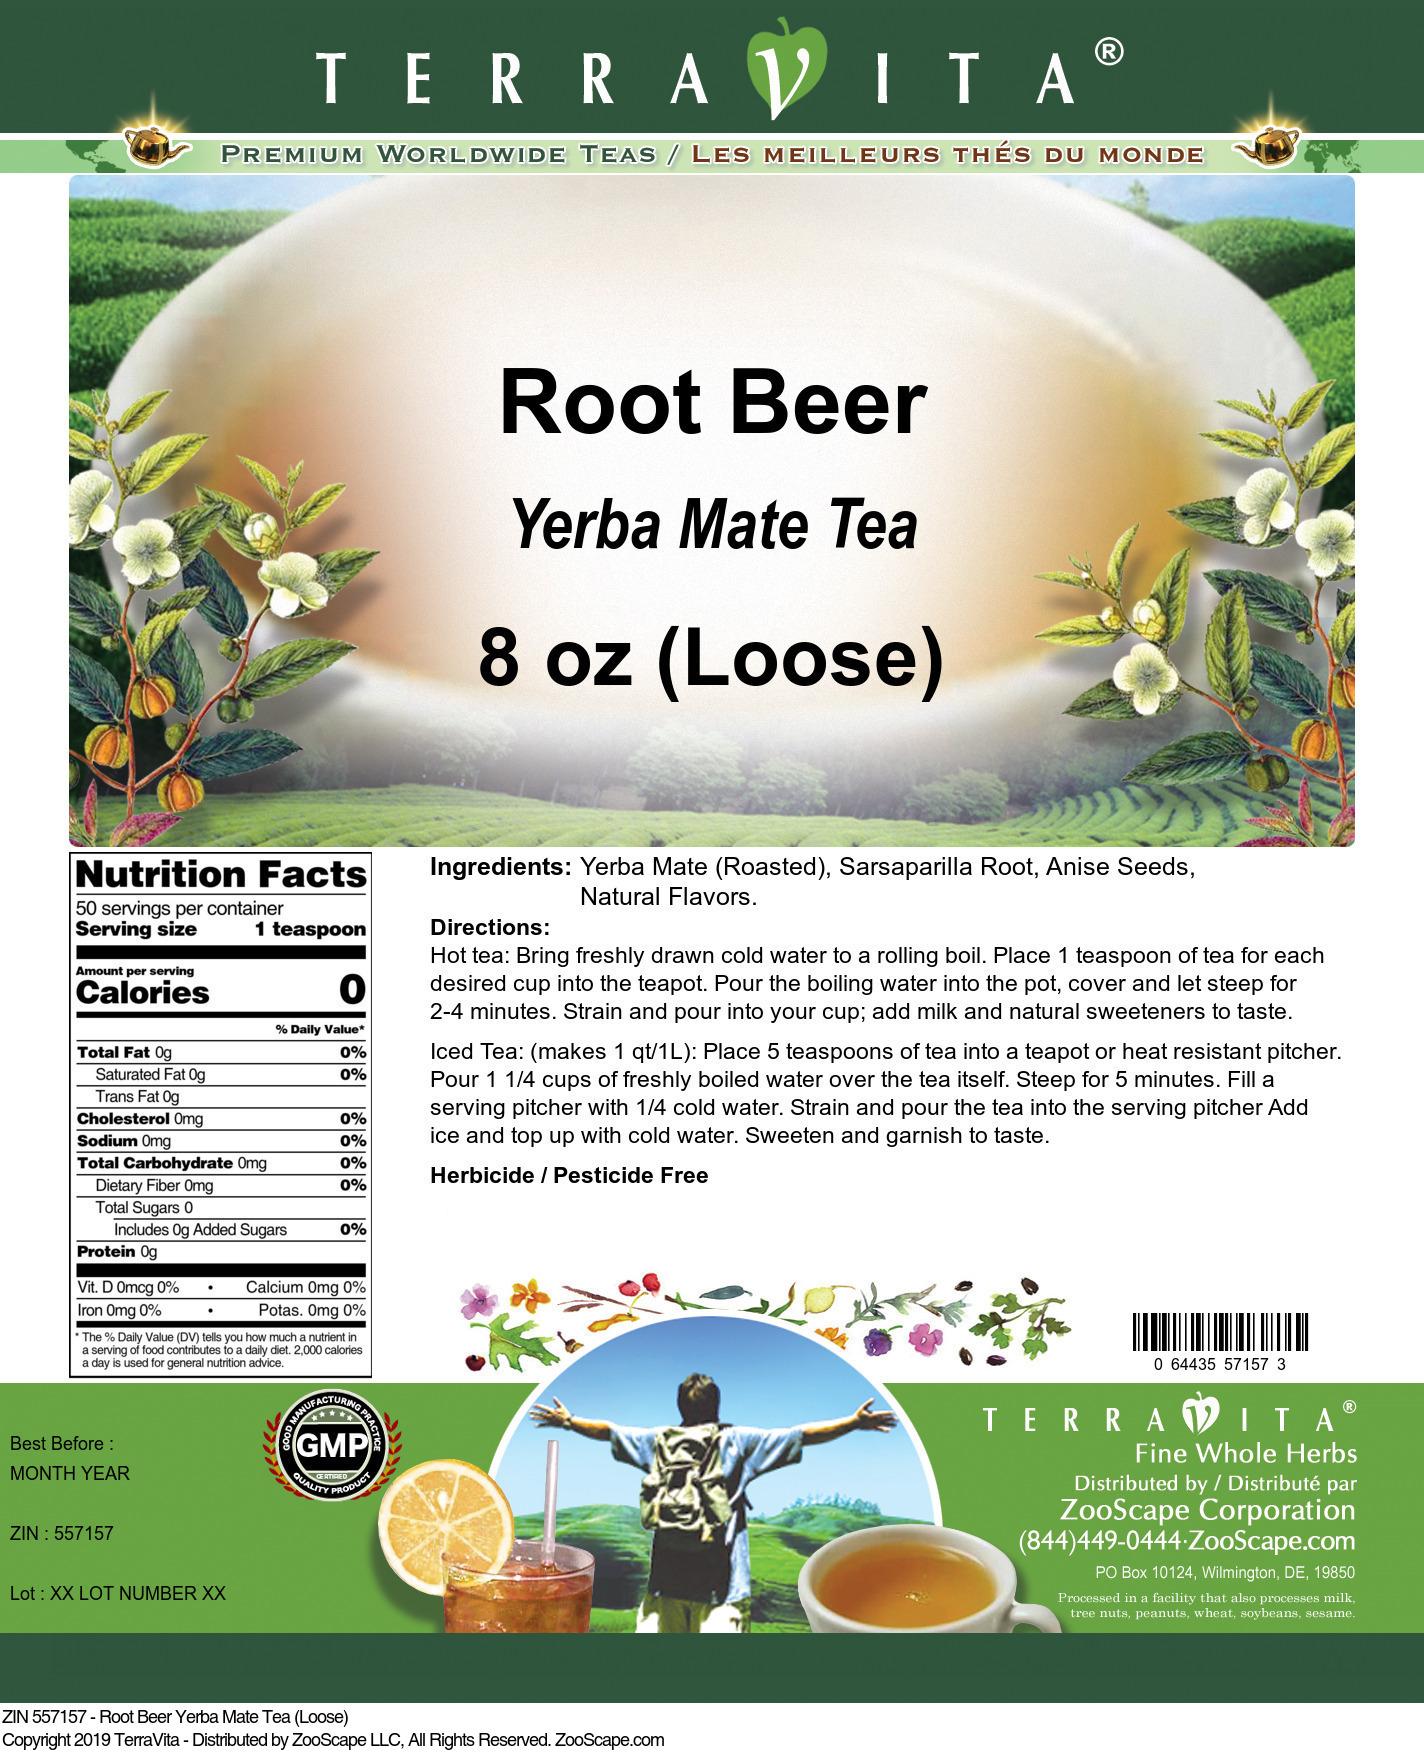 Root Beer Yerba Mate